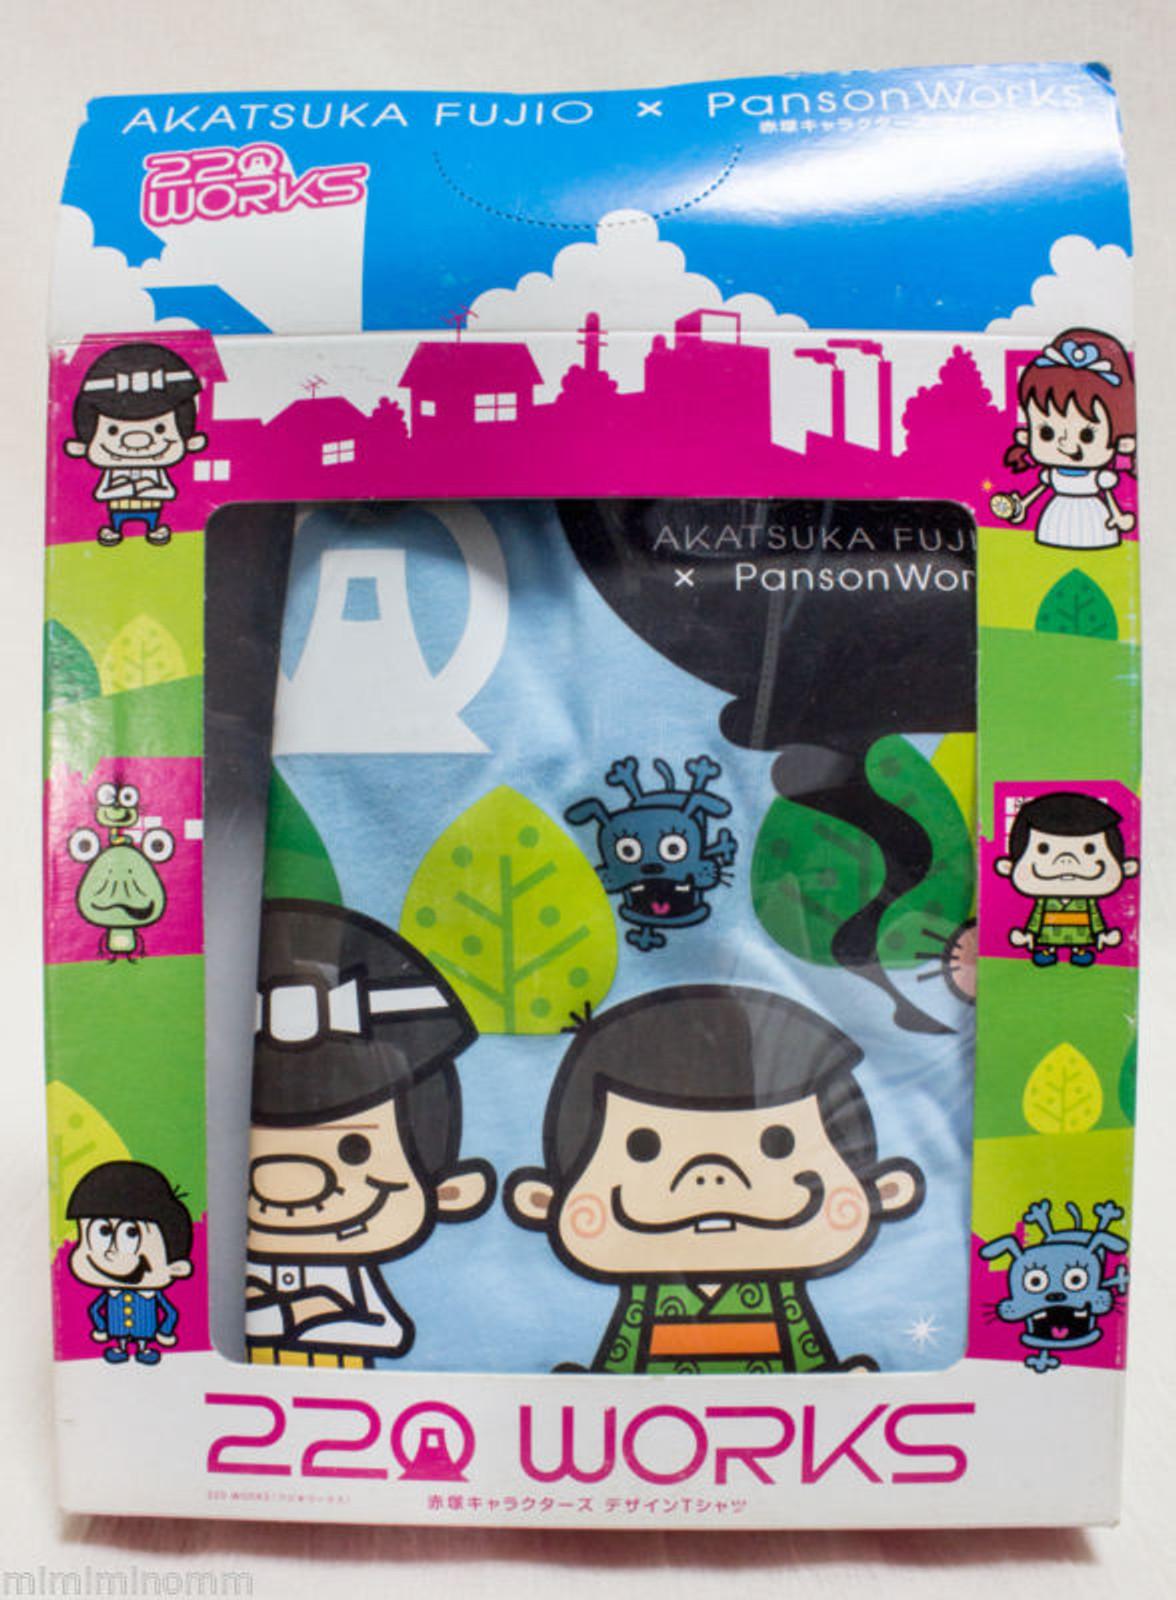 Akatsuka Fujio x Panson Works Tensai Bakabon T-shirt 220 Works JAPAN ANIME